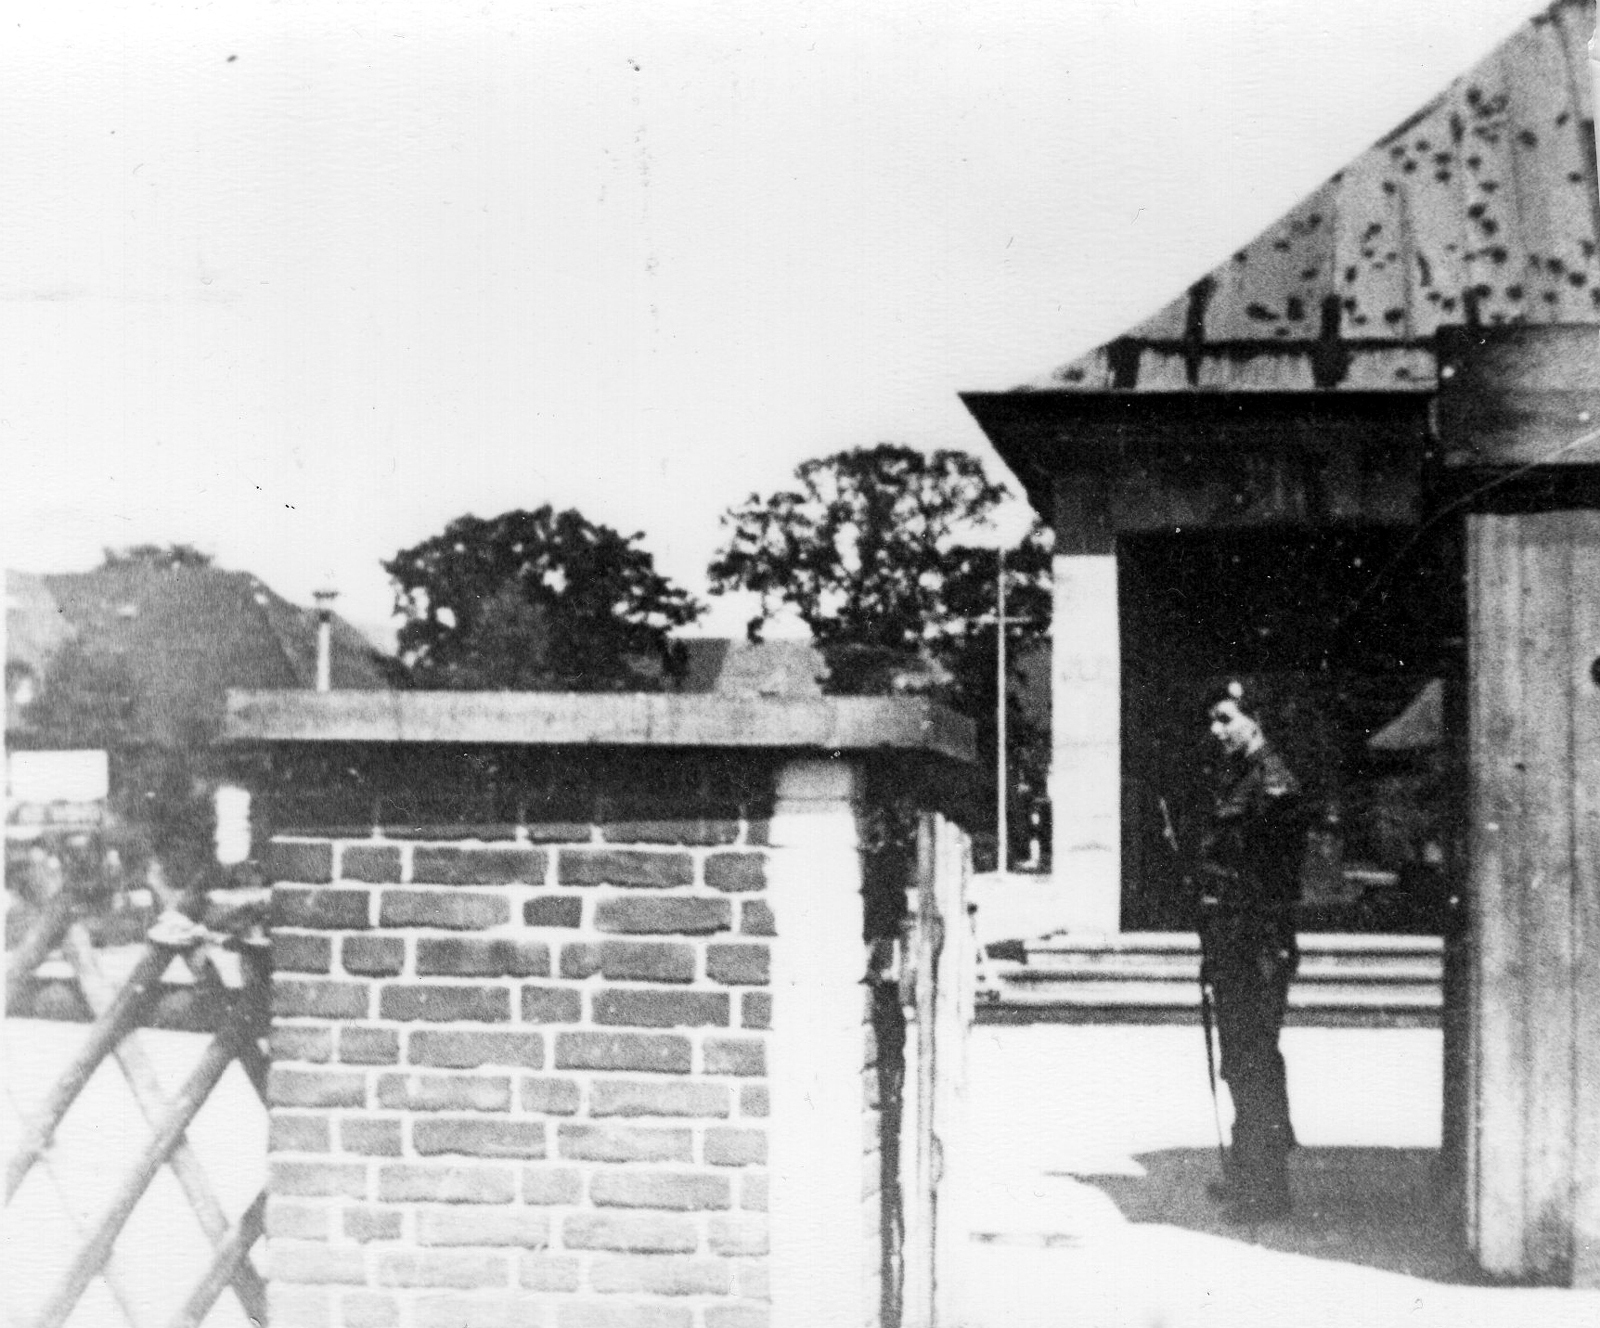 RAF Regiment Serviceman Standing On Sentry Duty, 85 Wing, Blankenese c.1947